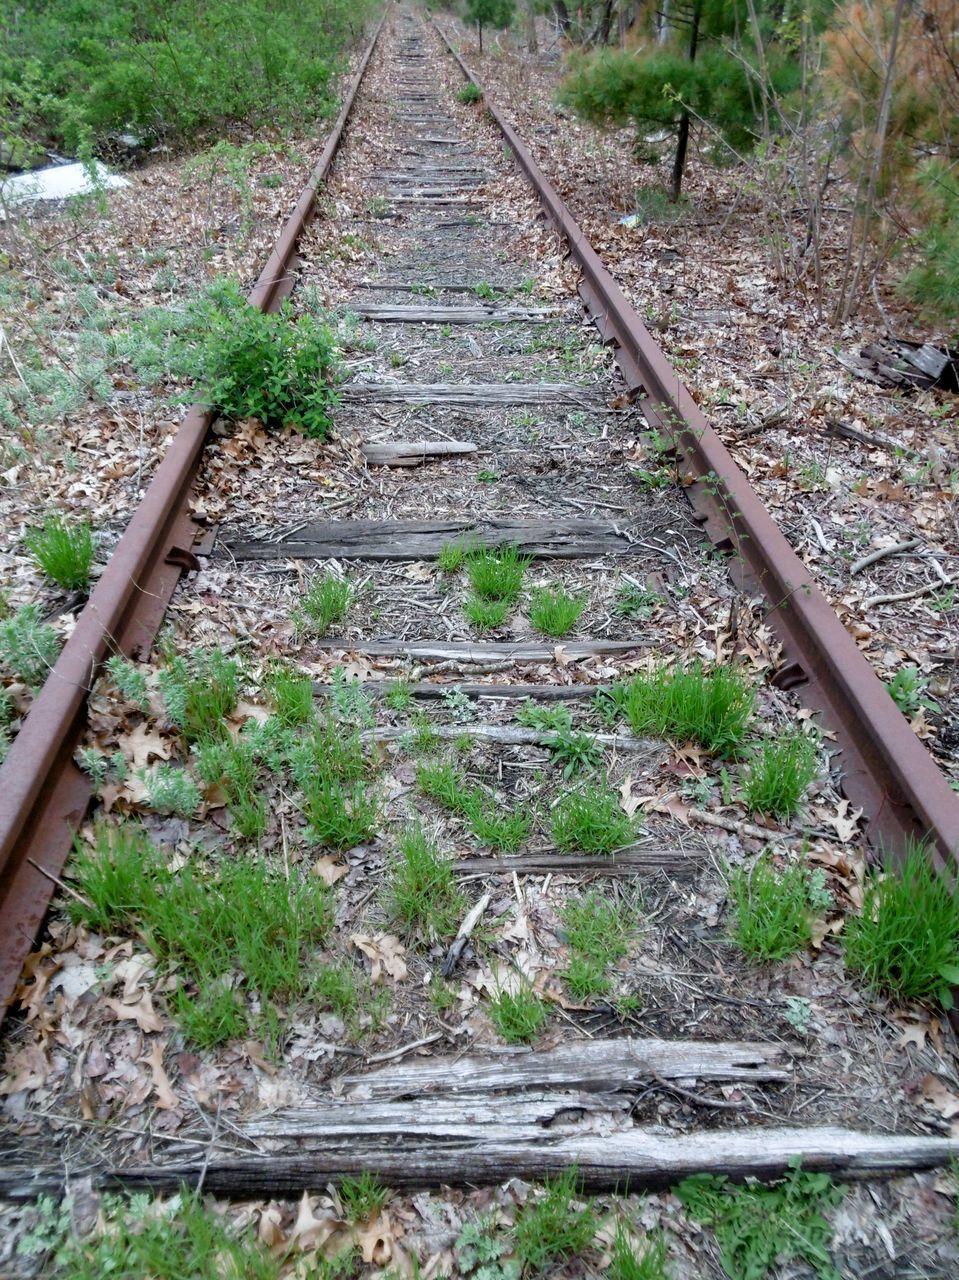 railroad track, rail transportation, railroad tie, transportation, no people, railway track, day, railroad, outdoors, nature, railway, parallel